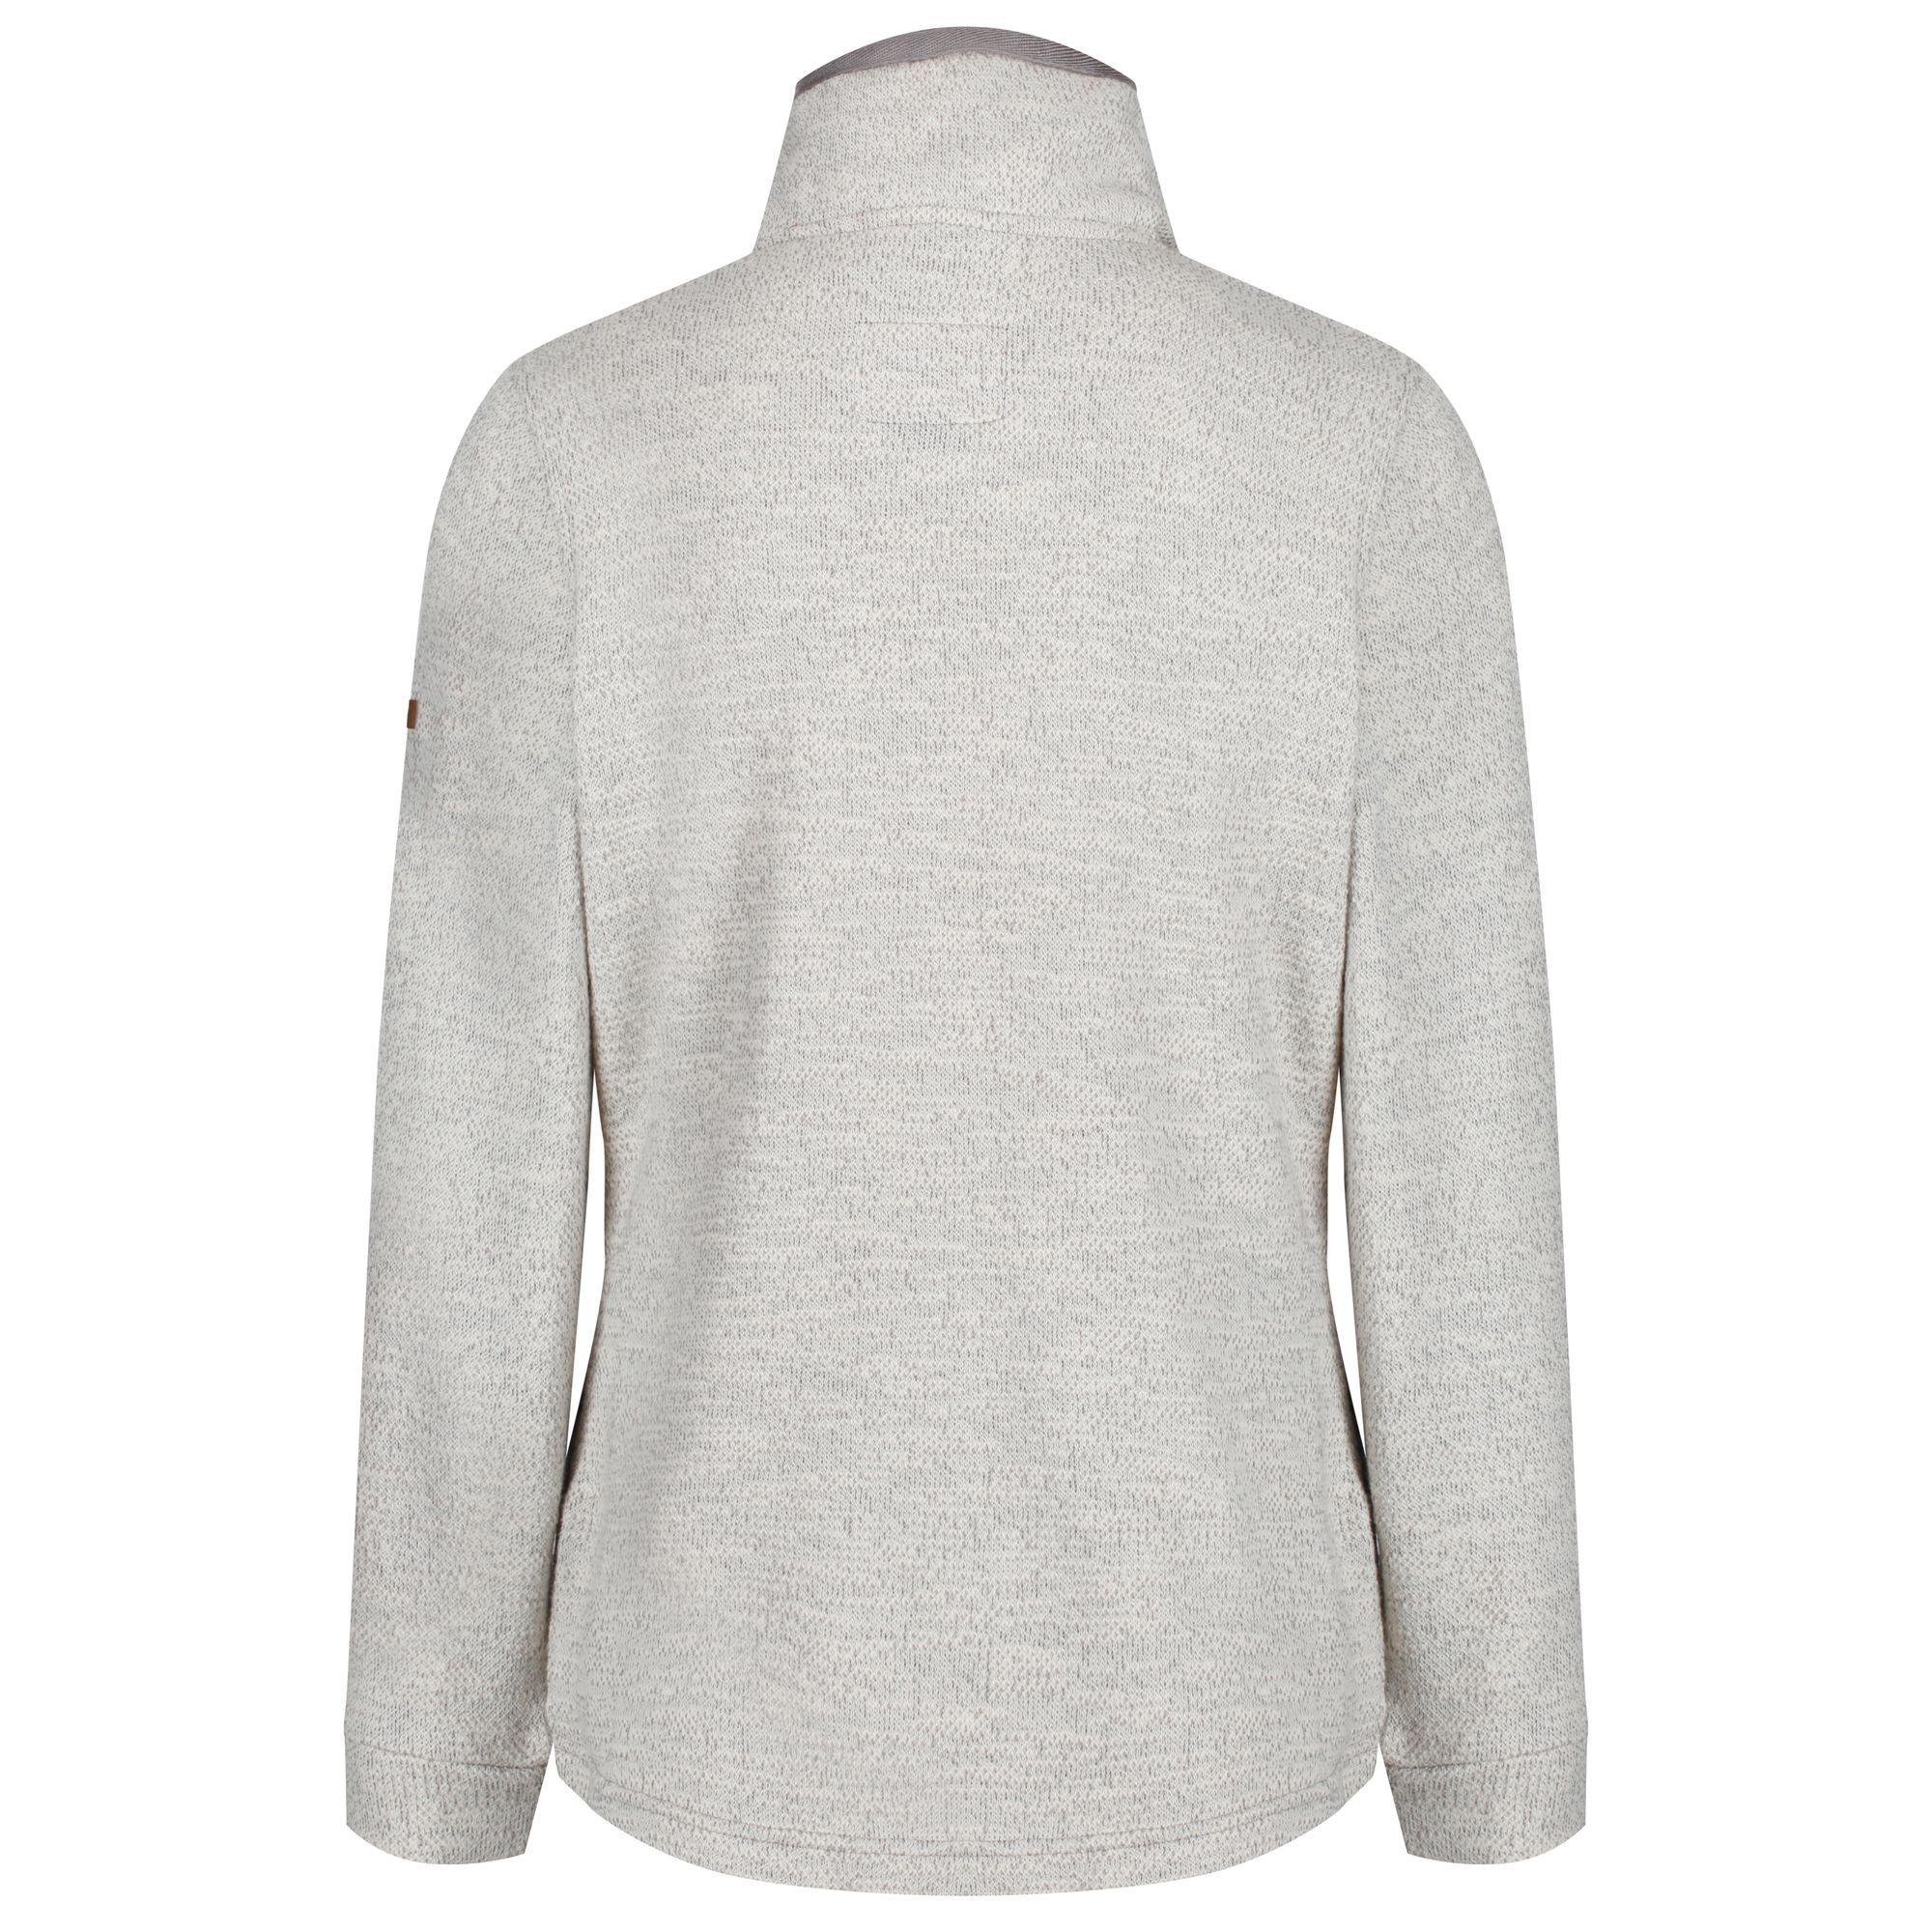 Regatta-Odetta-Womens-Warm-Curved-Full-Zip-Fleece-Jacket-RRP-50 thumbnail 13